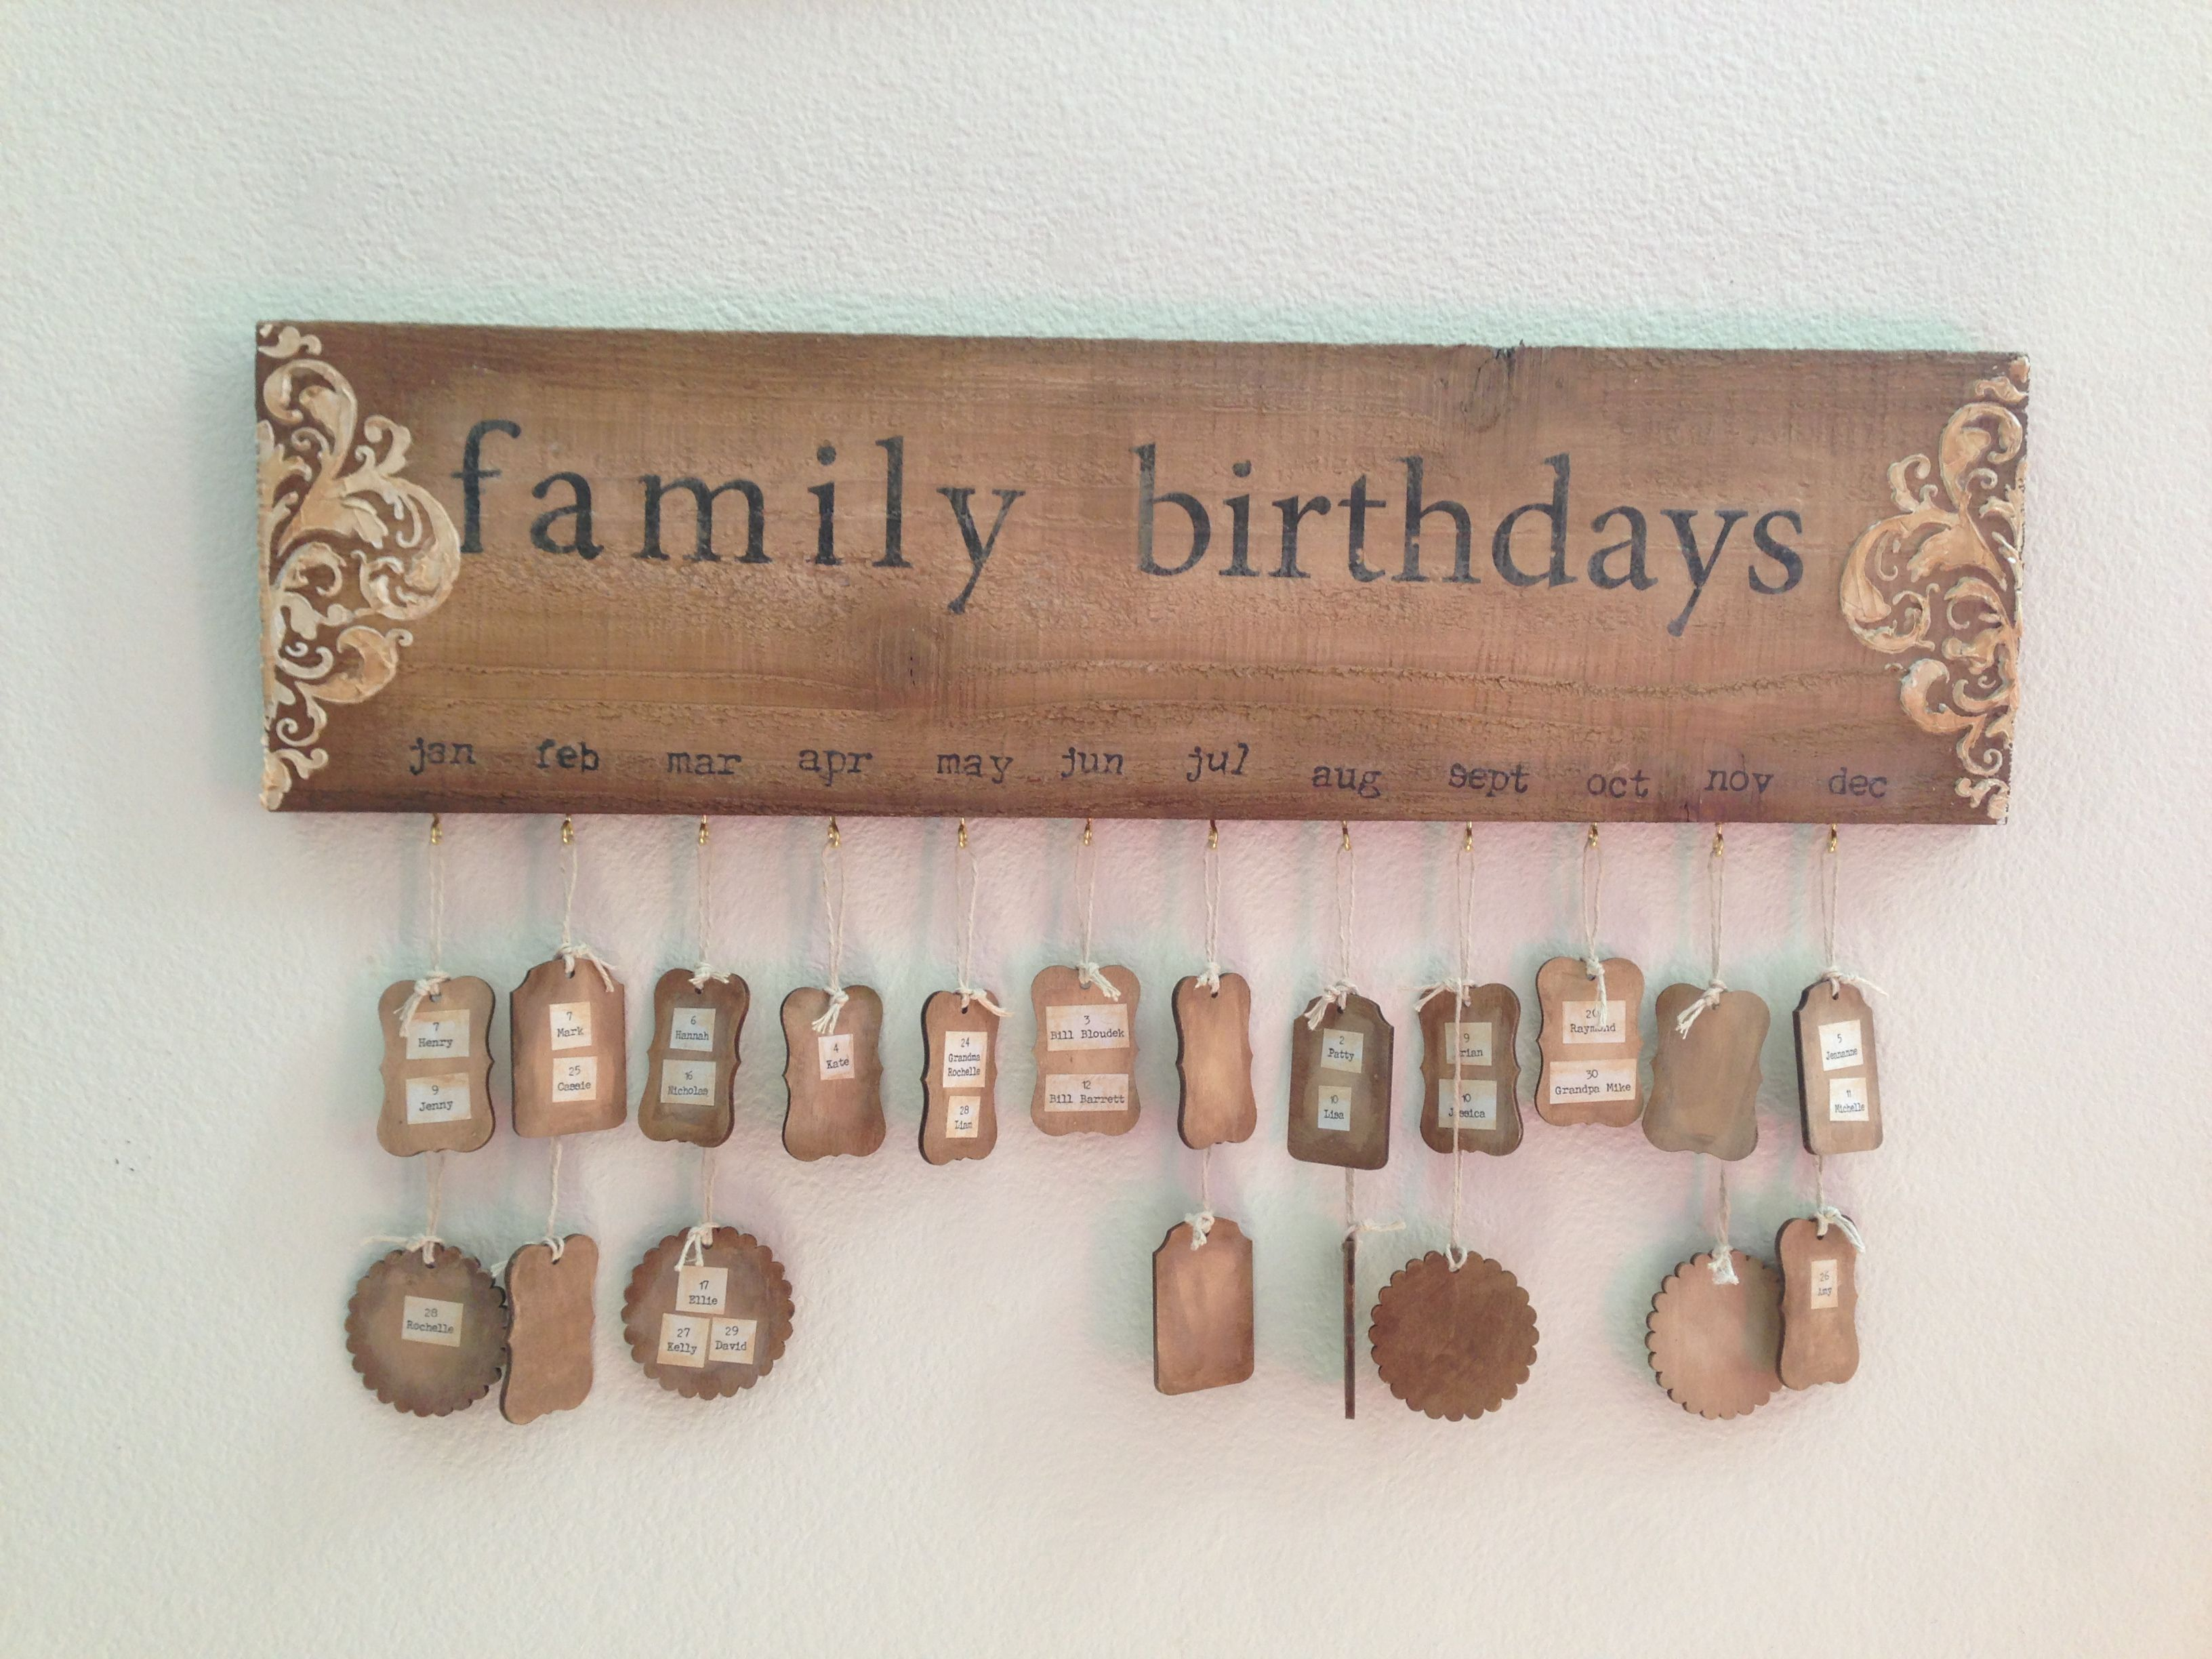 Happiness Transform Family Birthday Calendar Family Birthdays Birthday Calendar